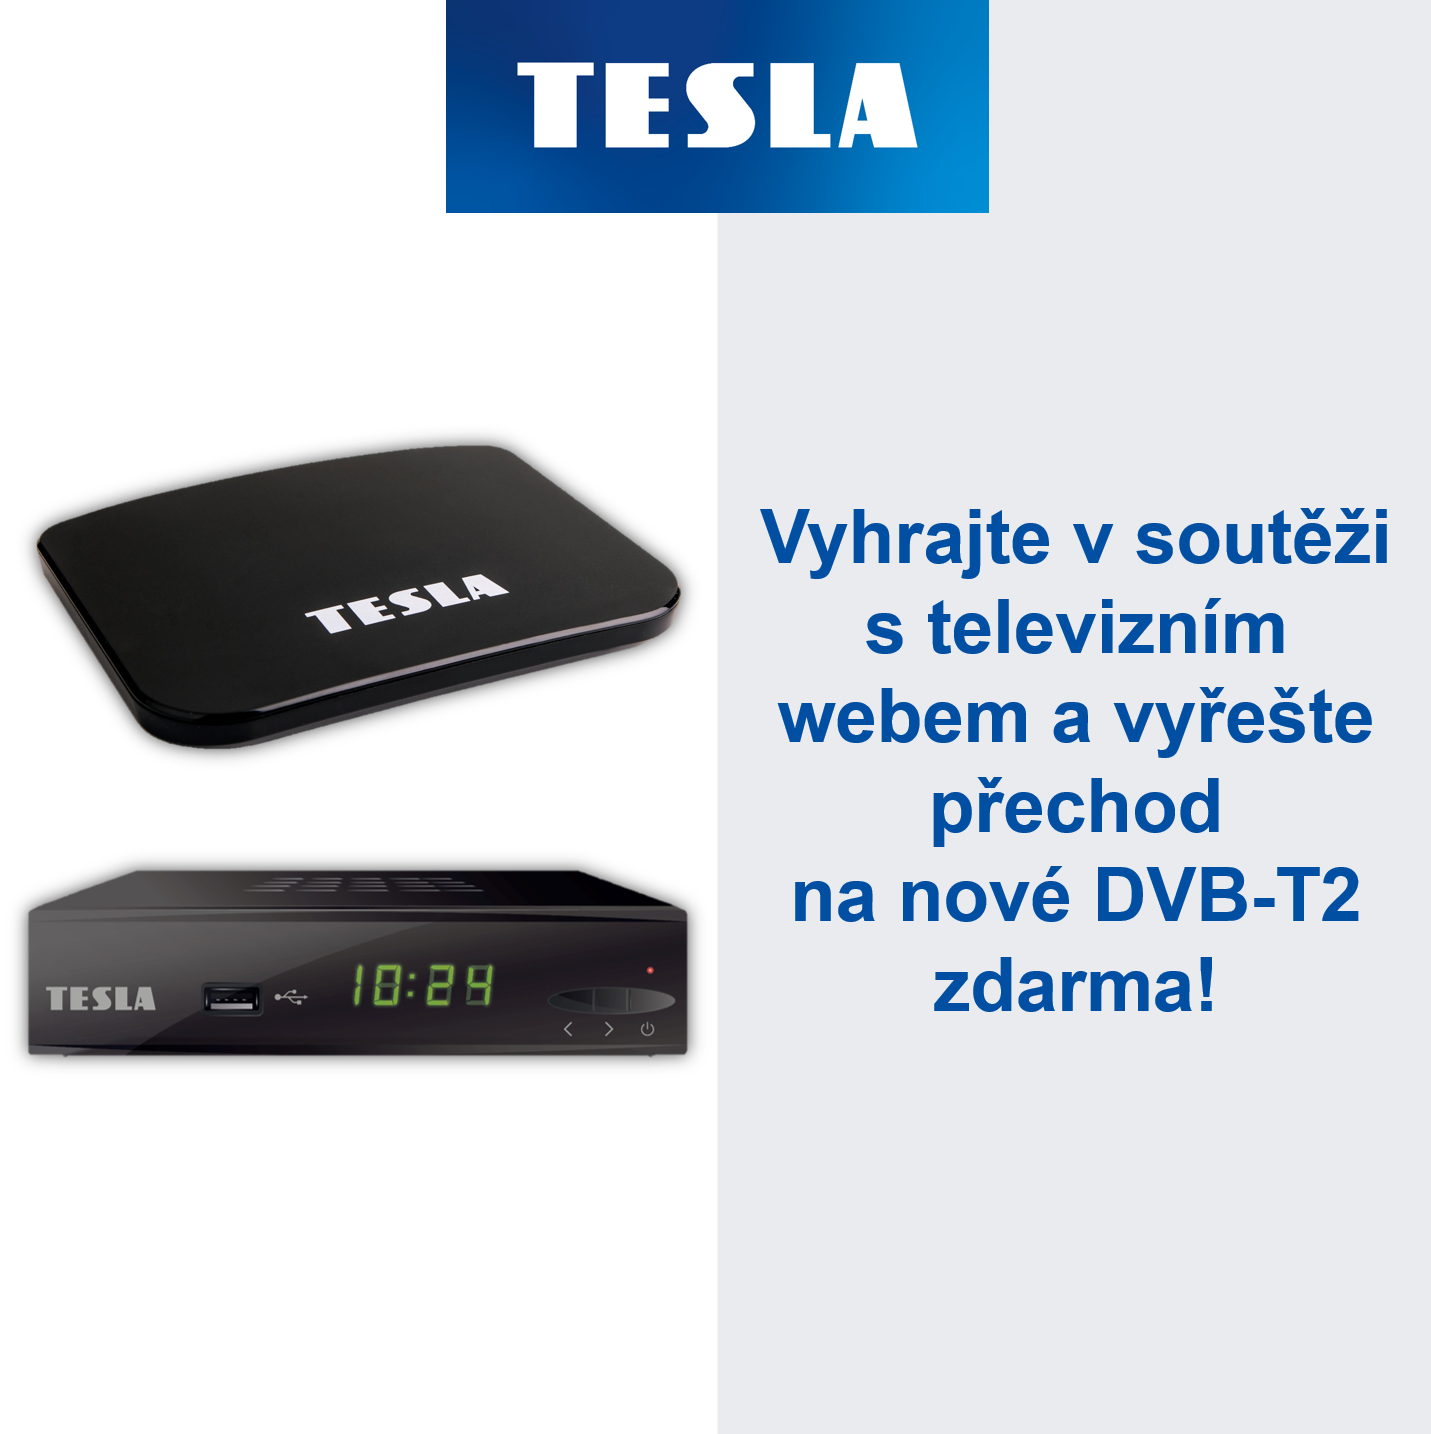 Soutěž o Set-Top boxy TESLA - Televizniweb.cz